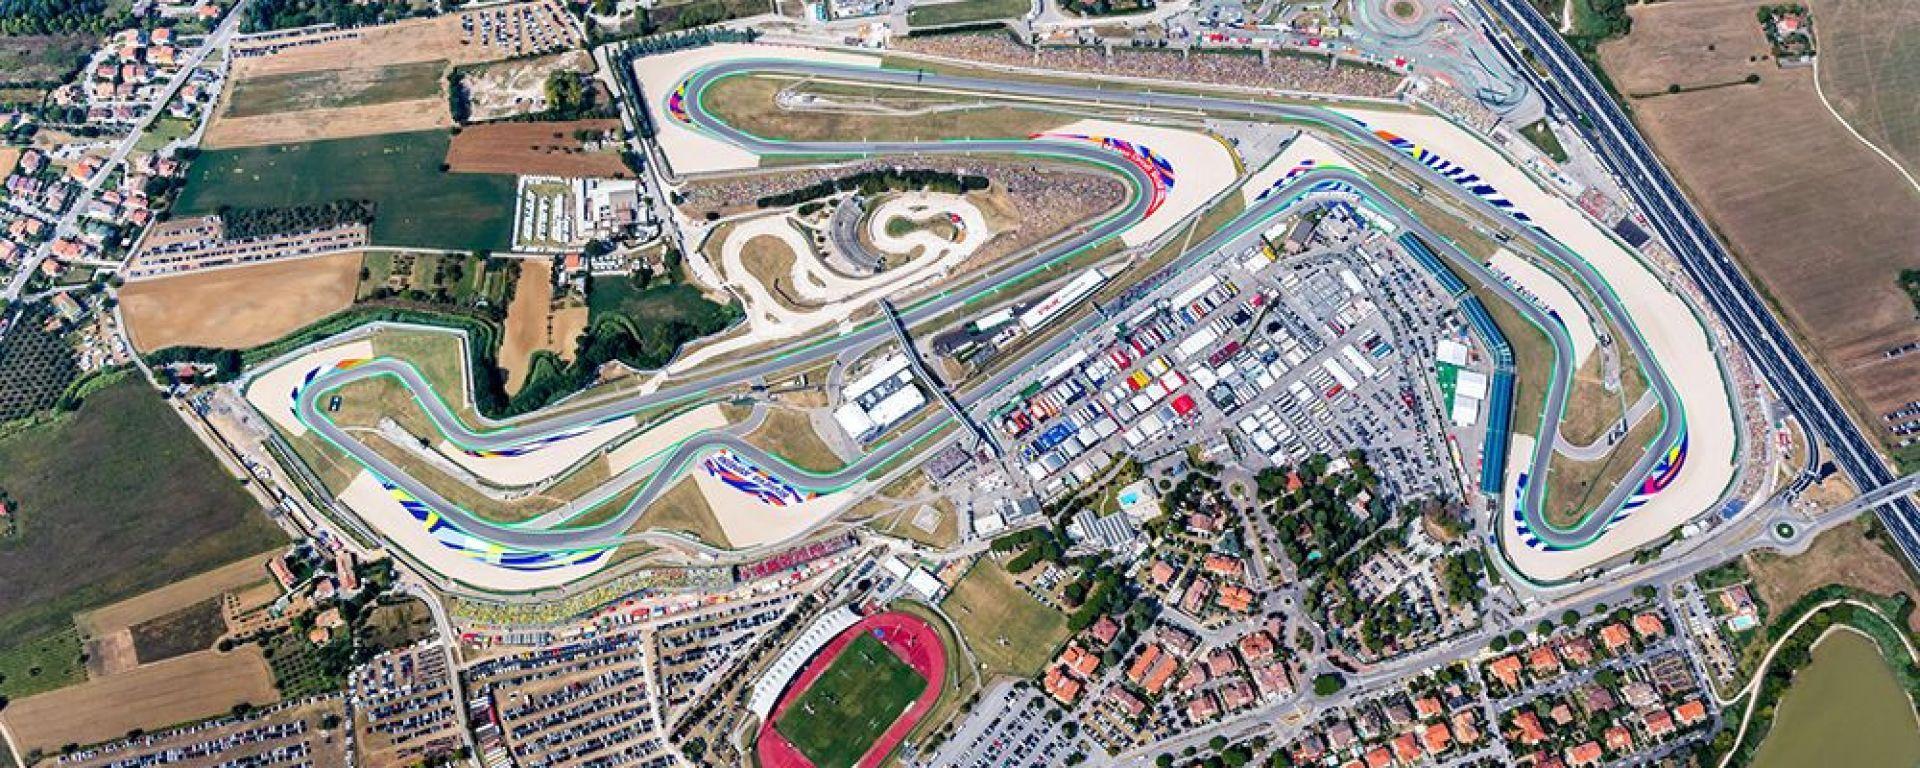 Misano Adriatico, Marco Simoncelli Misano World Circuit